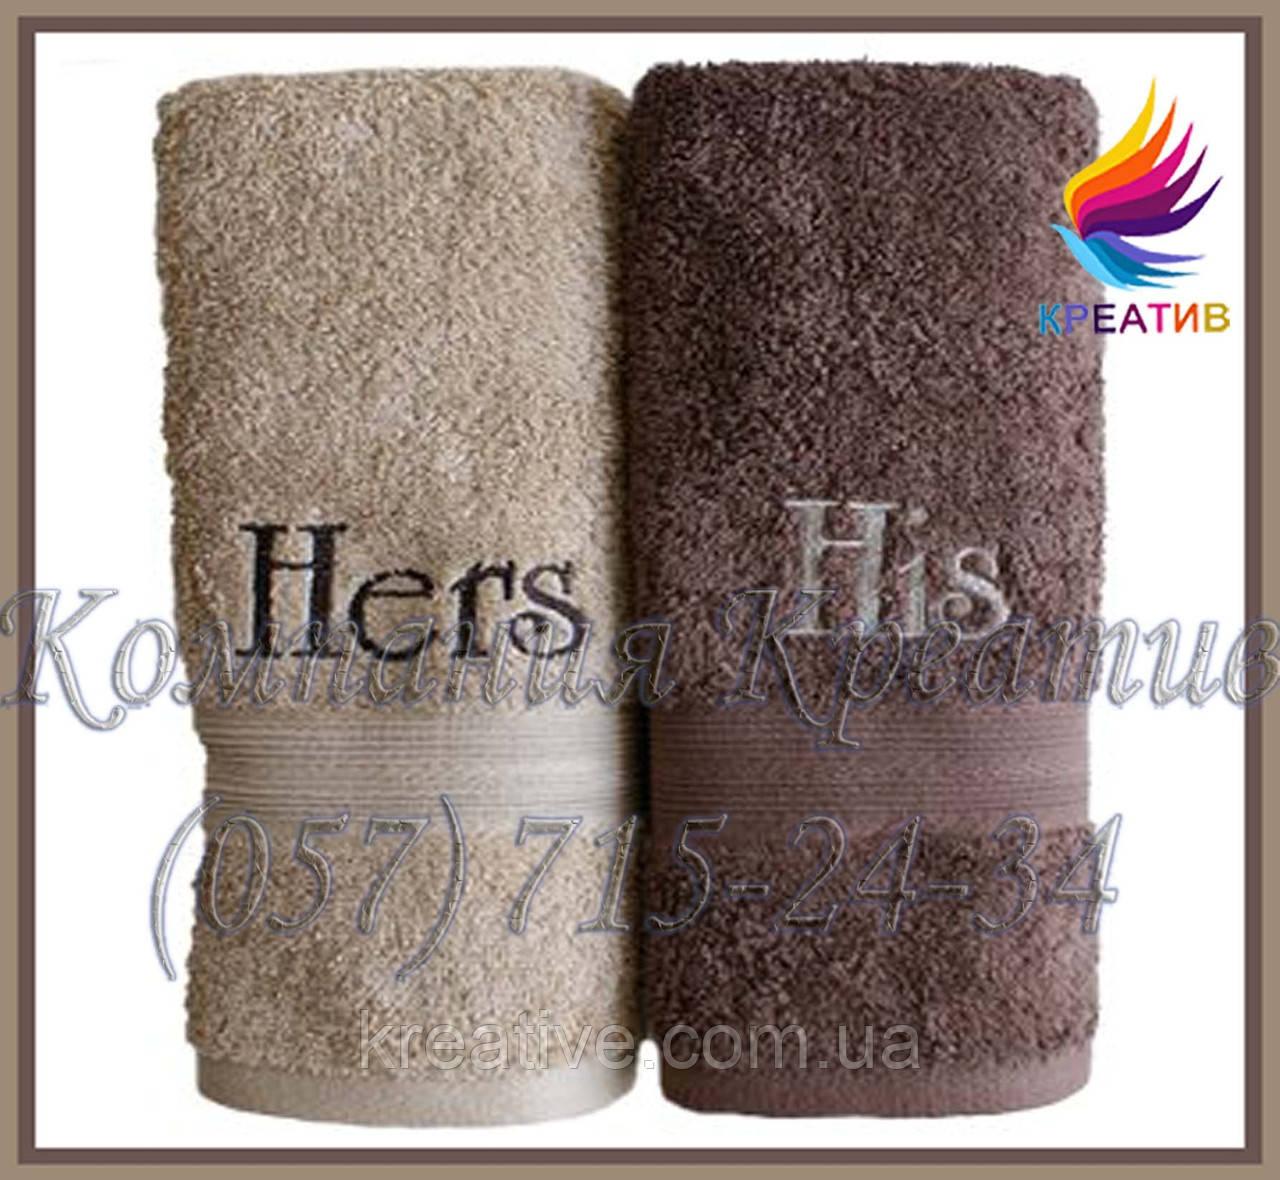 Полотенца с вышивкой (под заказ от 50 шт)